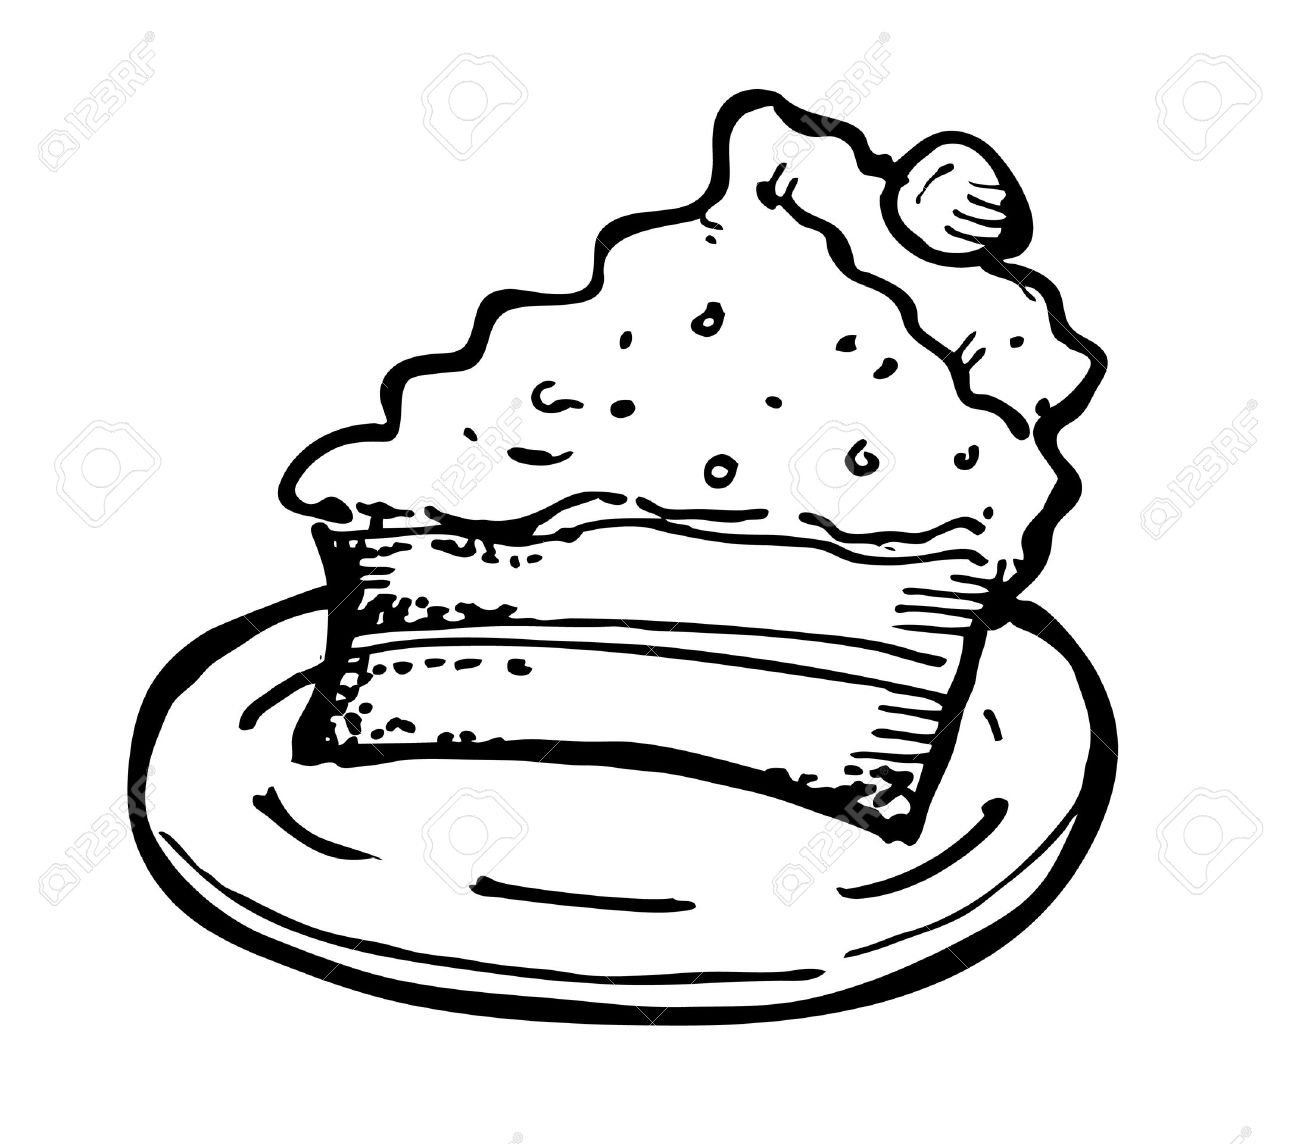 Cake Slice Drawing At Getdrawings